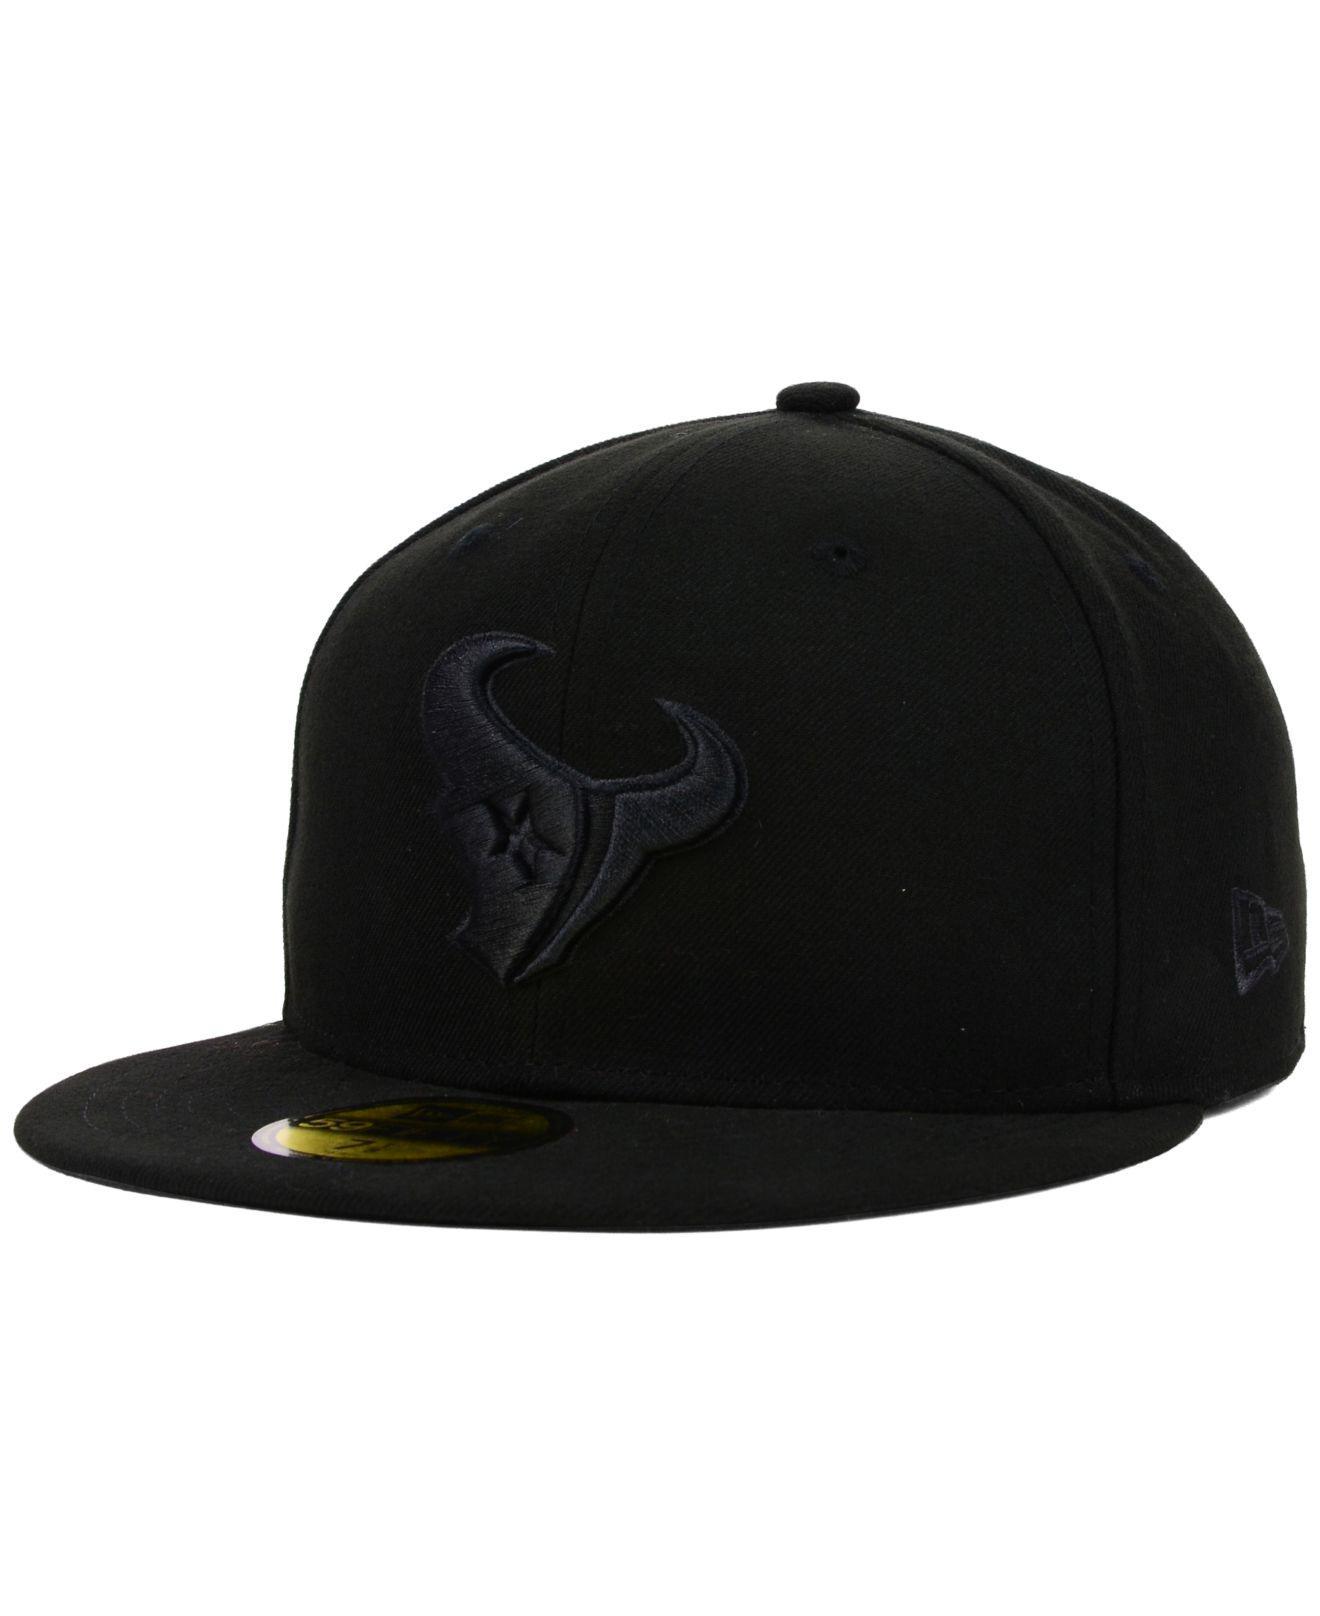 innovative design 27b76 1729b ... canada ktz houston texans nfl black on black 59fifty cap for men lyst.  view fullscreen